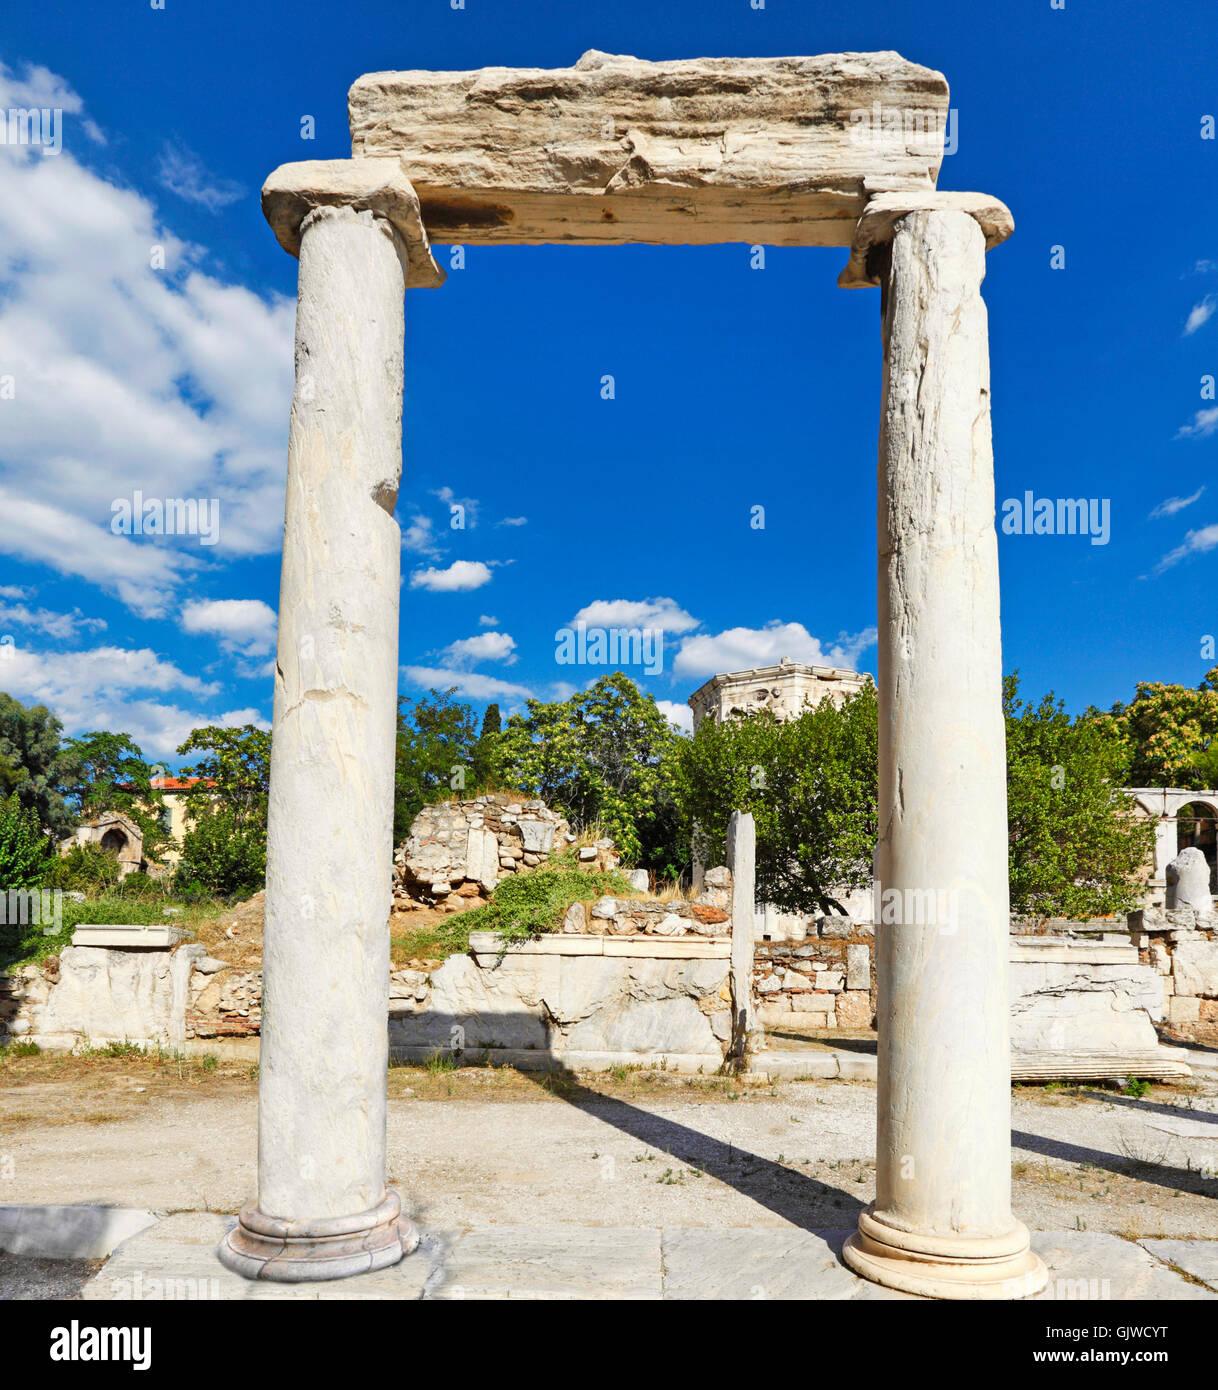 The Eastern Propylon in the Roman Agora, Greece - Stock Image